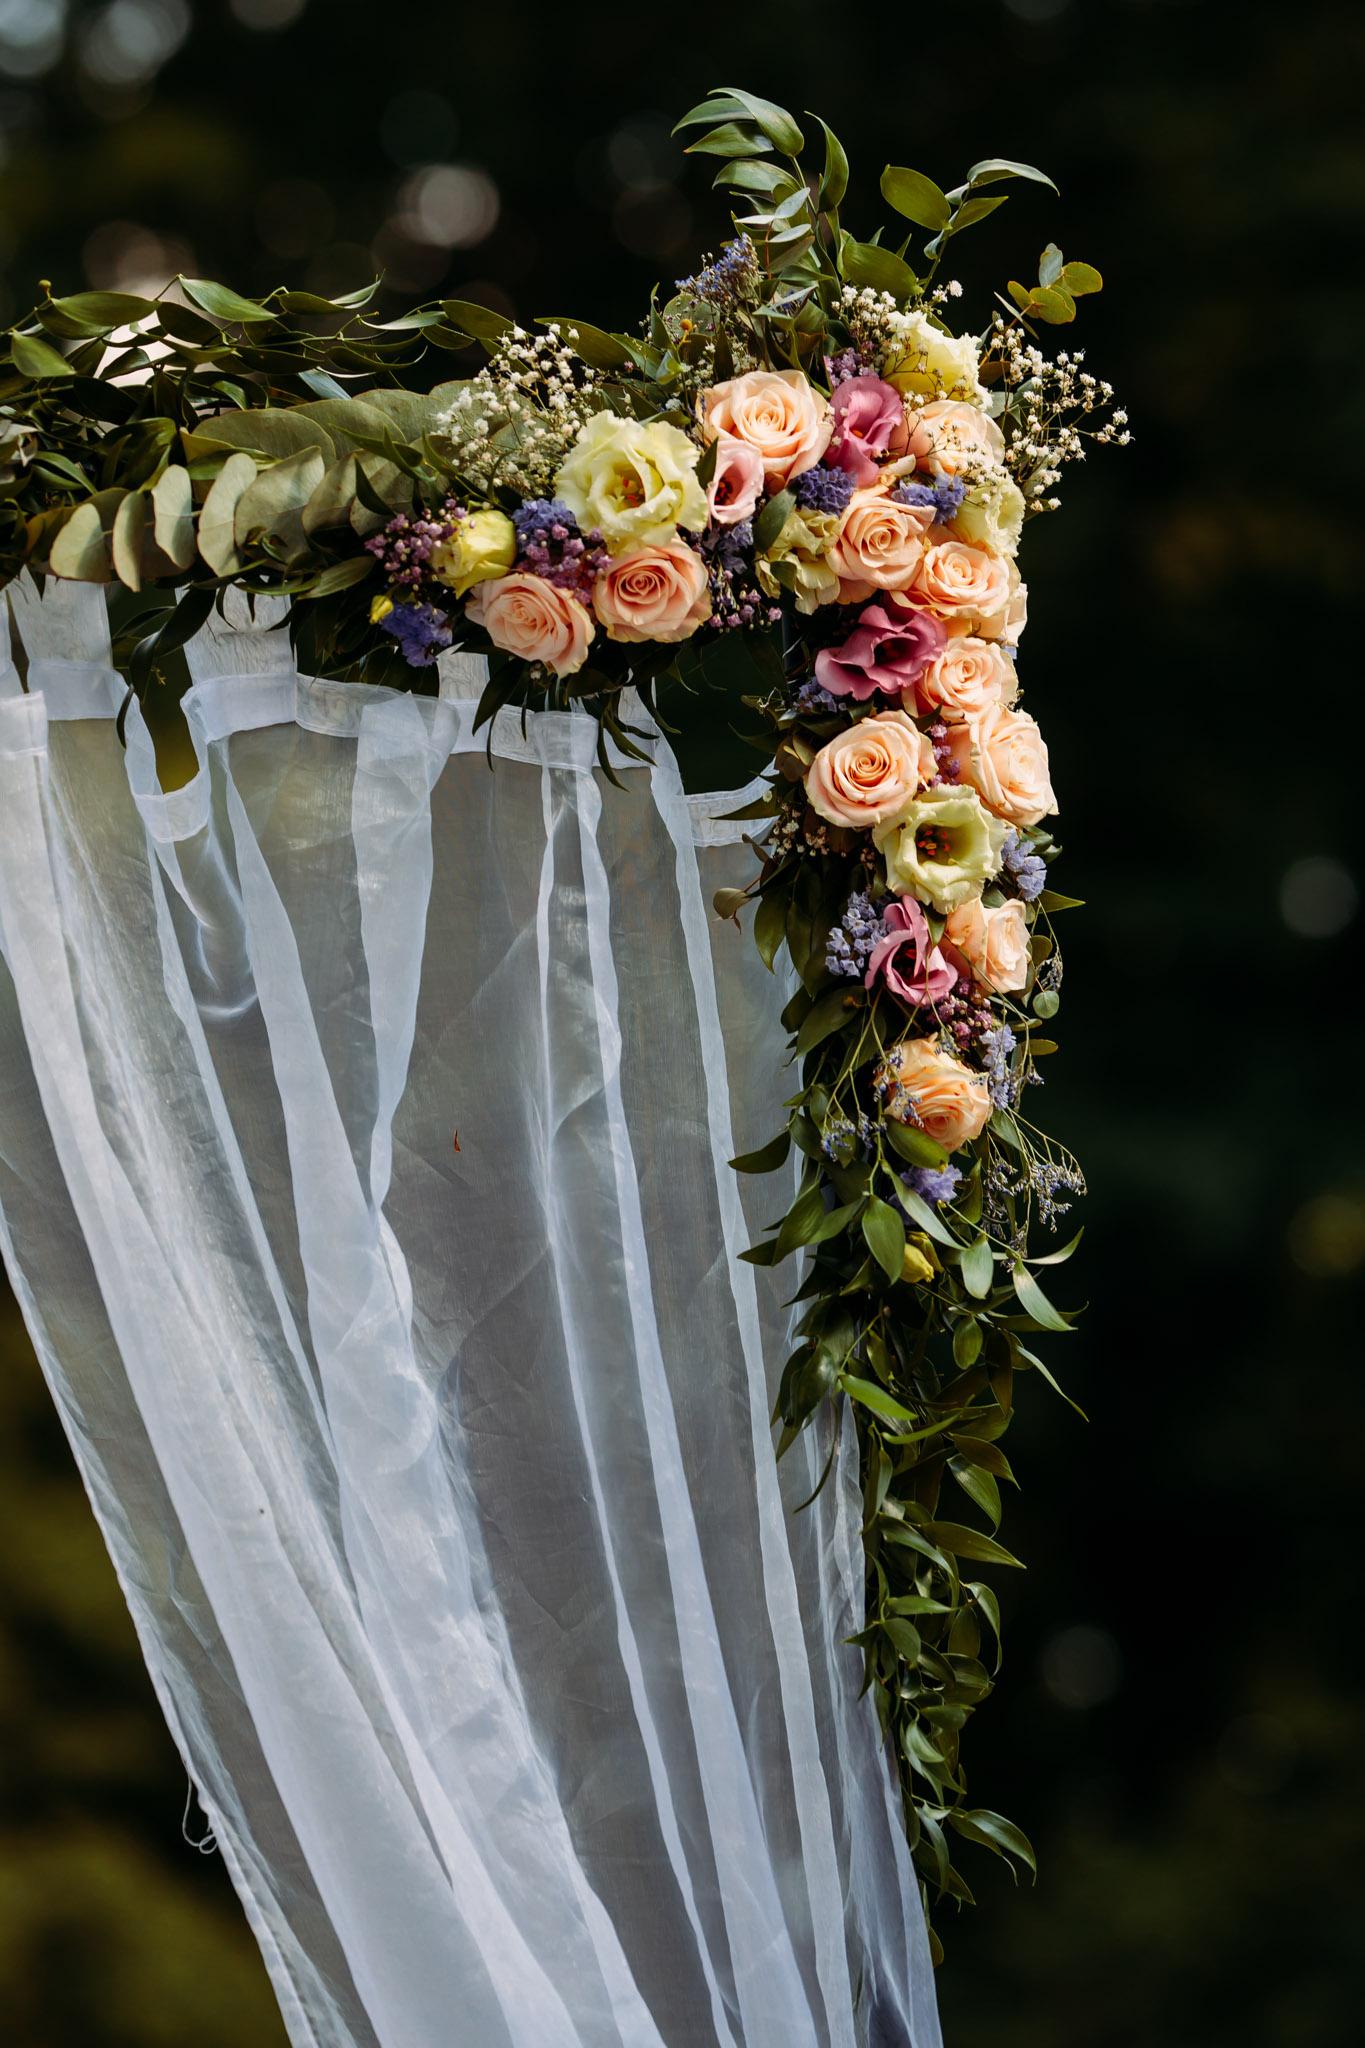 180729_Internationale_Hochzeit_Schloss_Britz_Berlin_web_0033.jpg